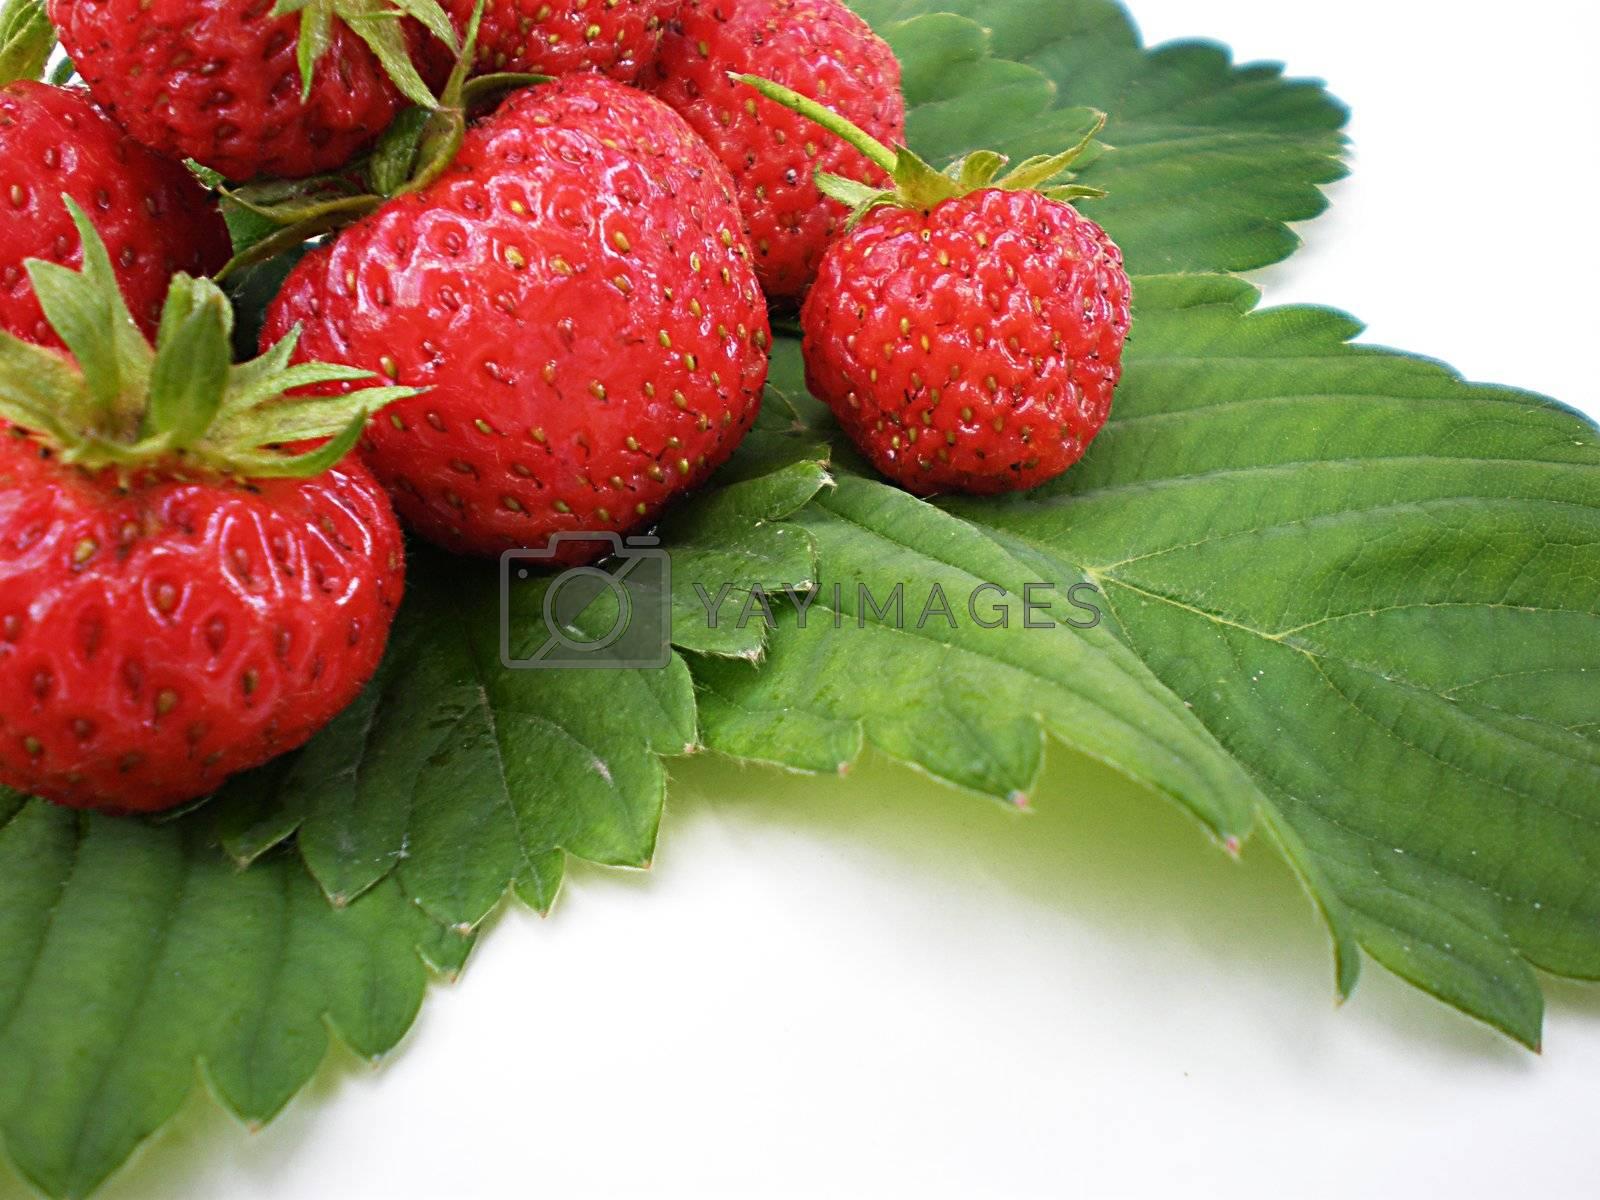 Royalty free image of strawberries by Dessie_bg